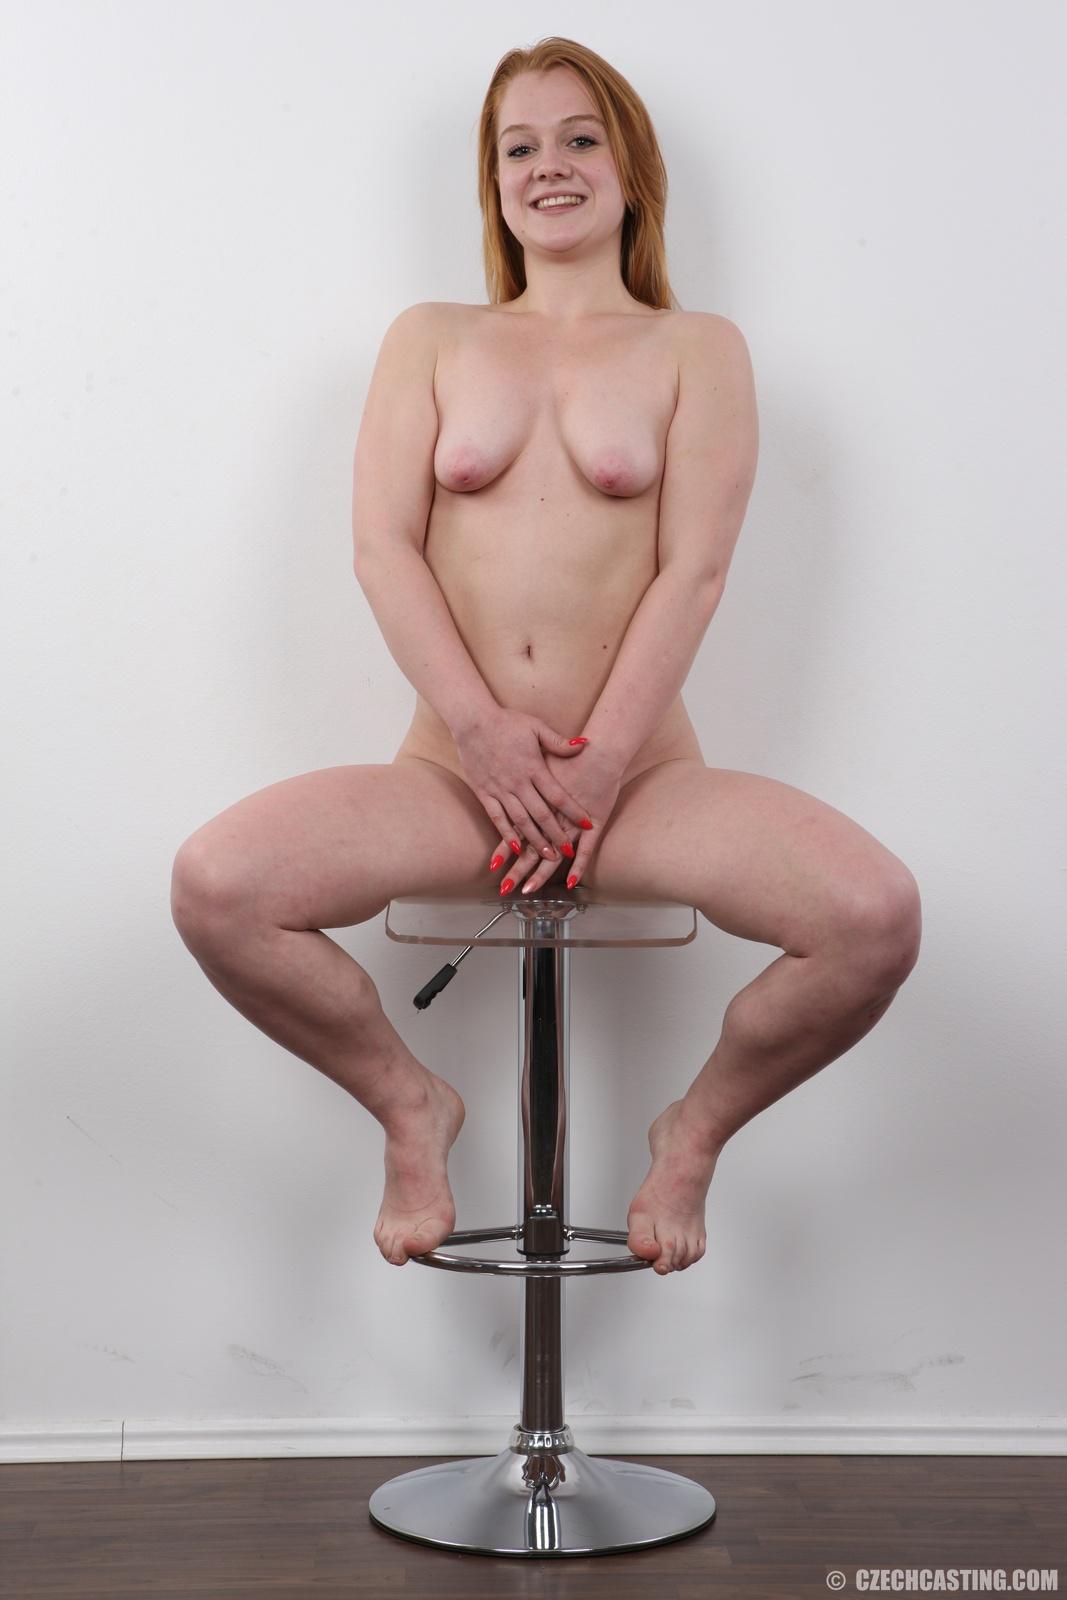 wpid-18-year-old-eliska-casting-photos36.jpg